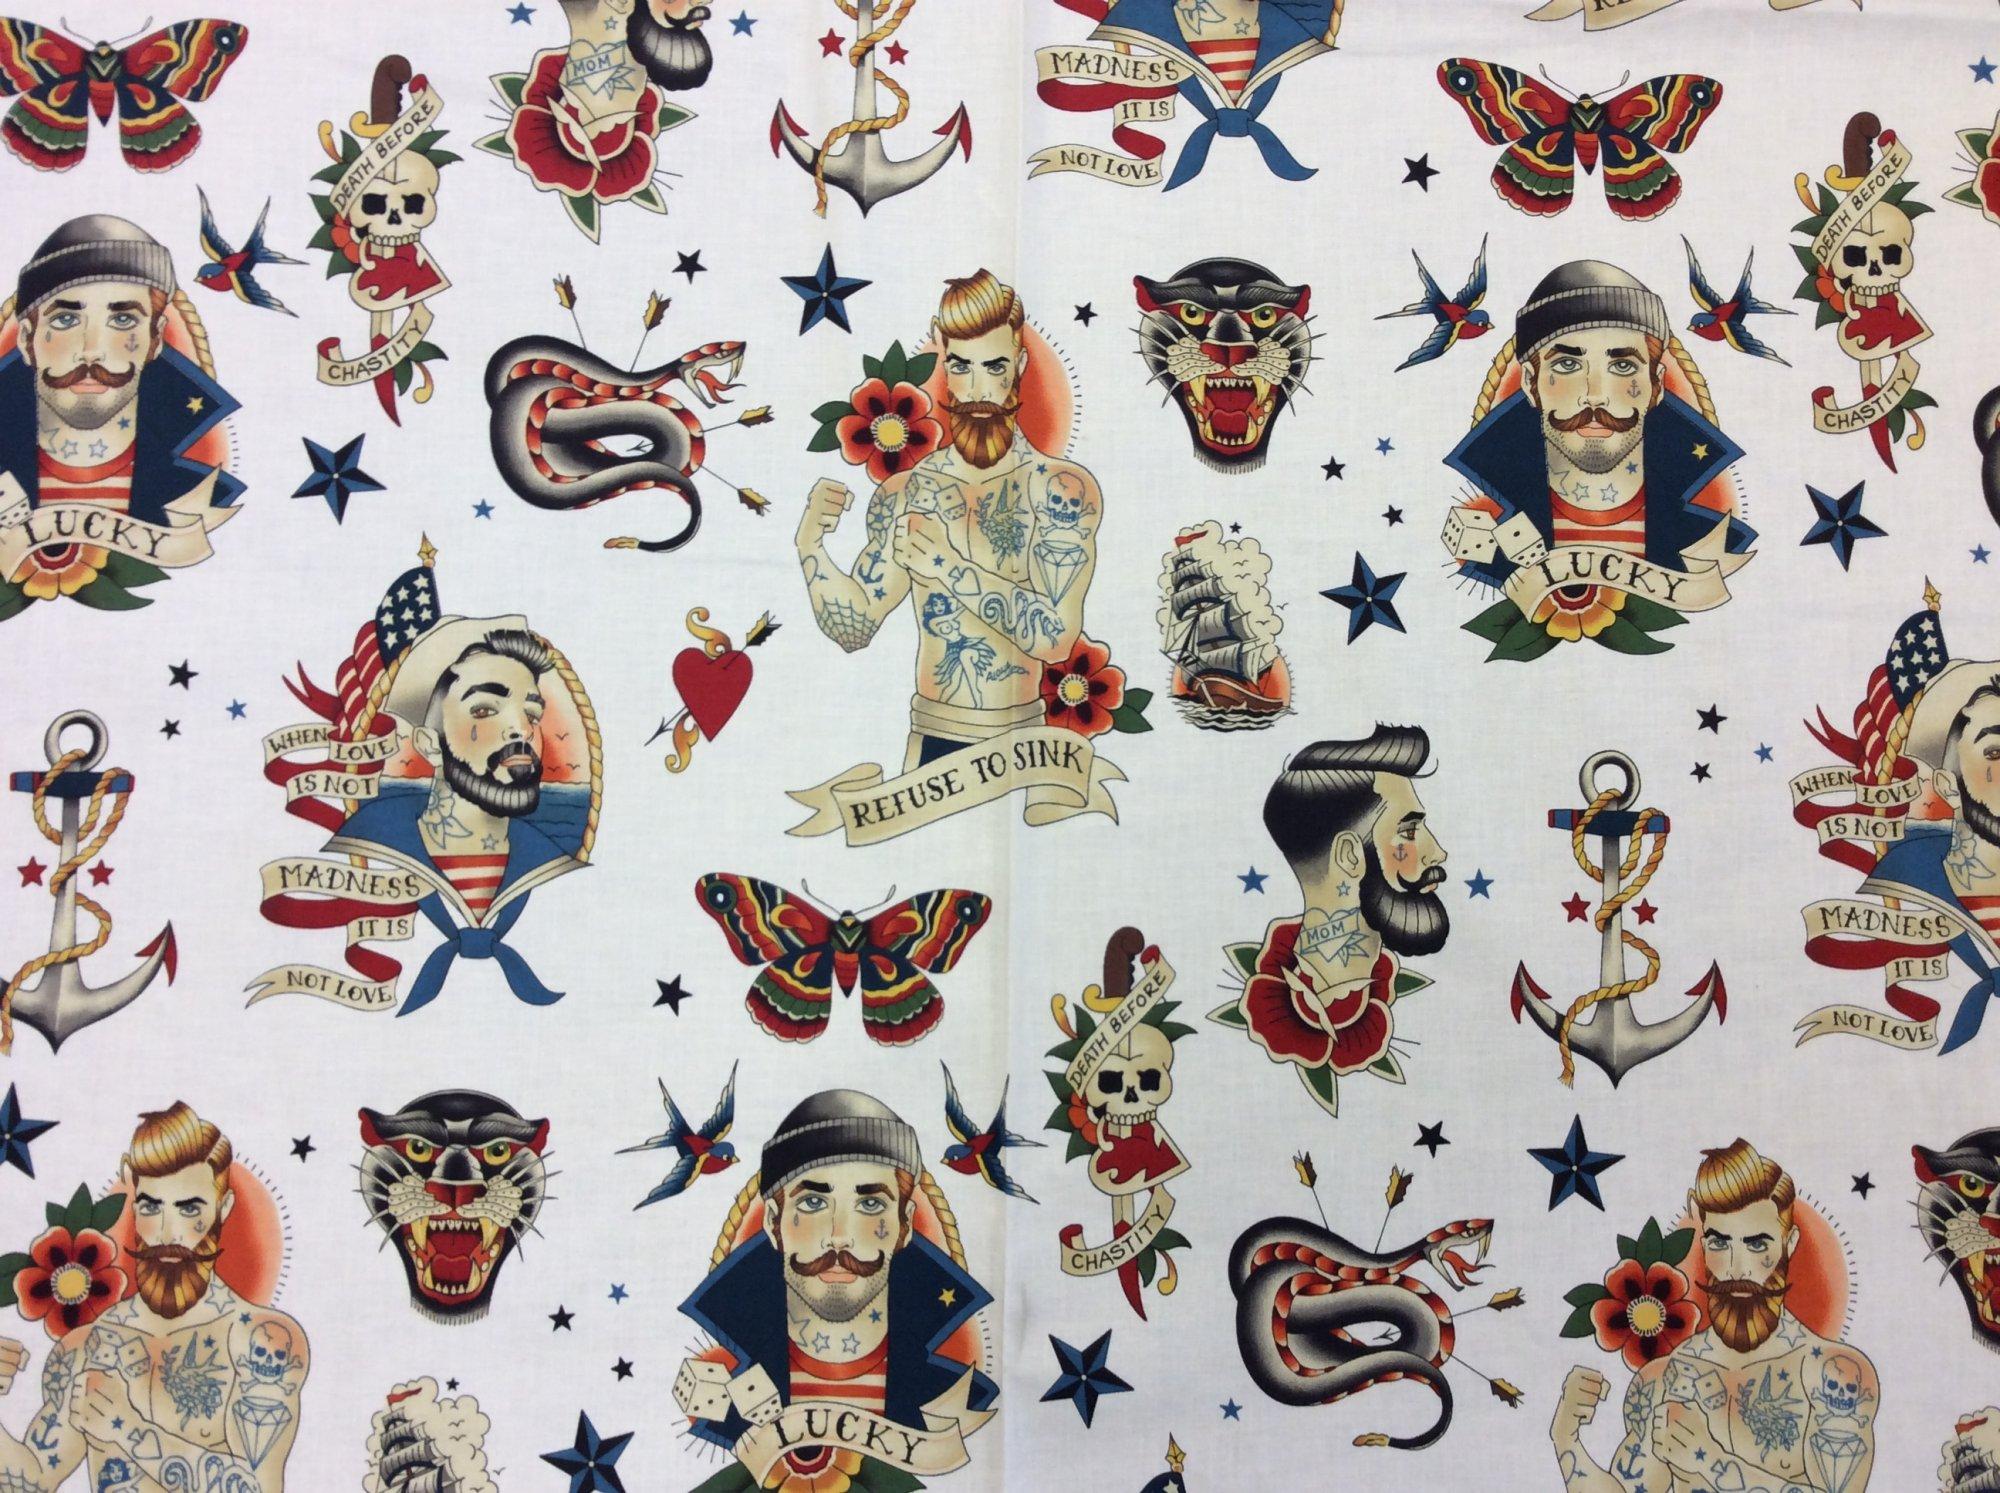 Tattoo Sailor Pin Up Men Retro Barber Hipster Cotton Quilt Fabric AH305